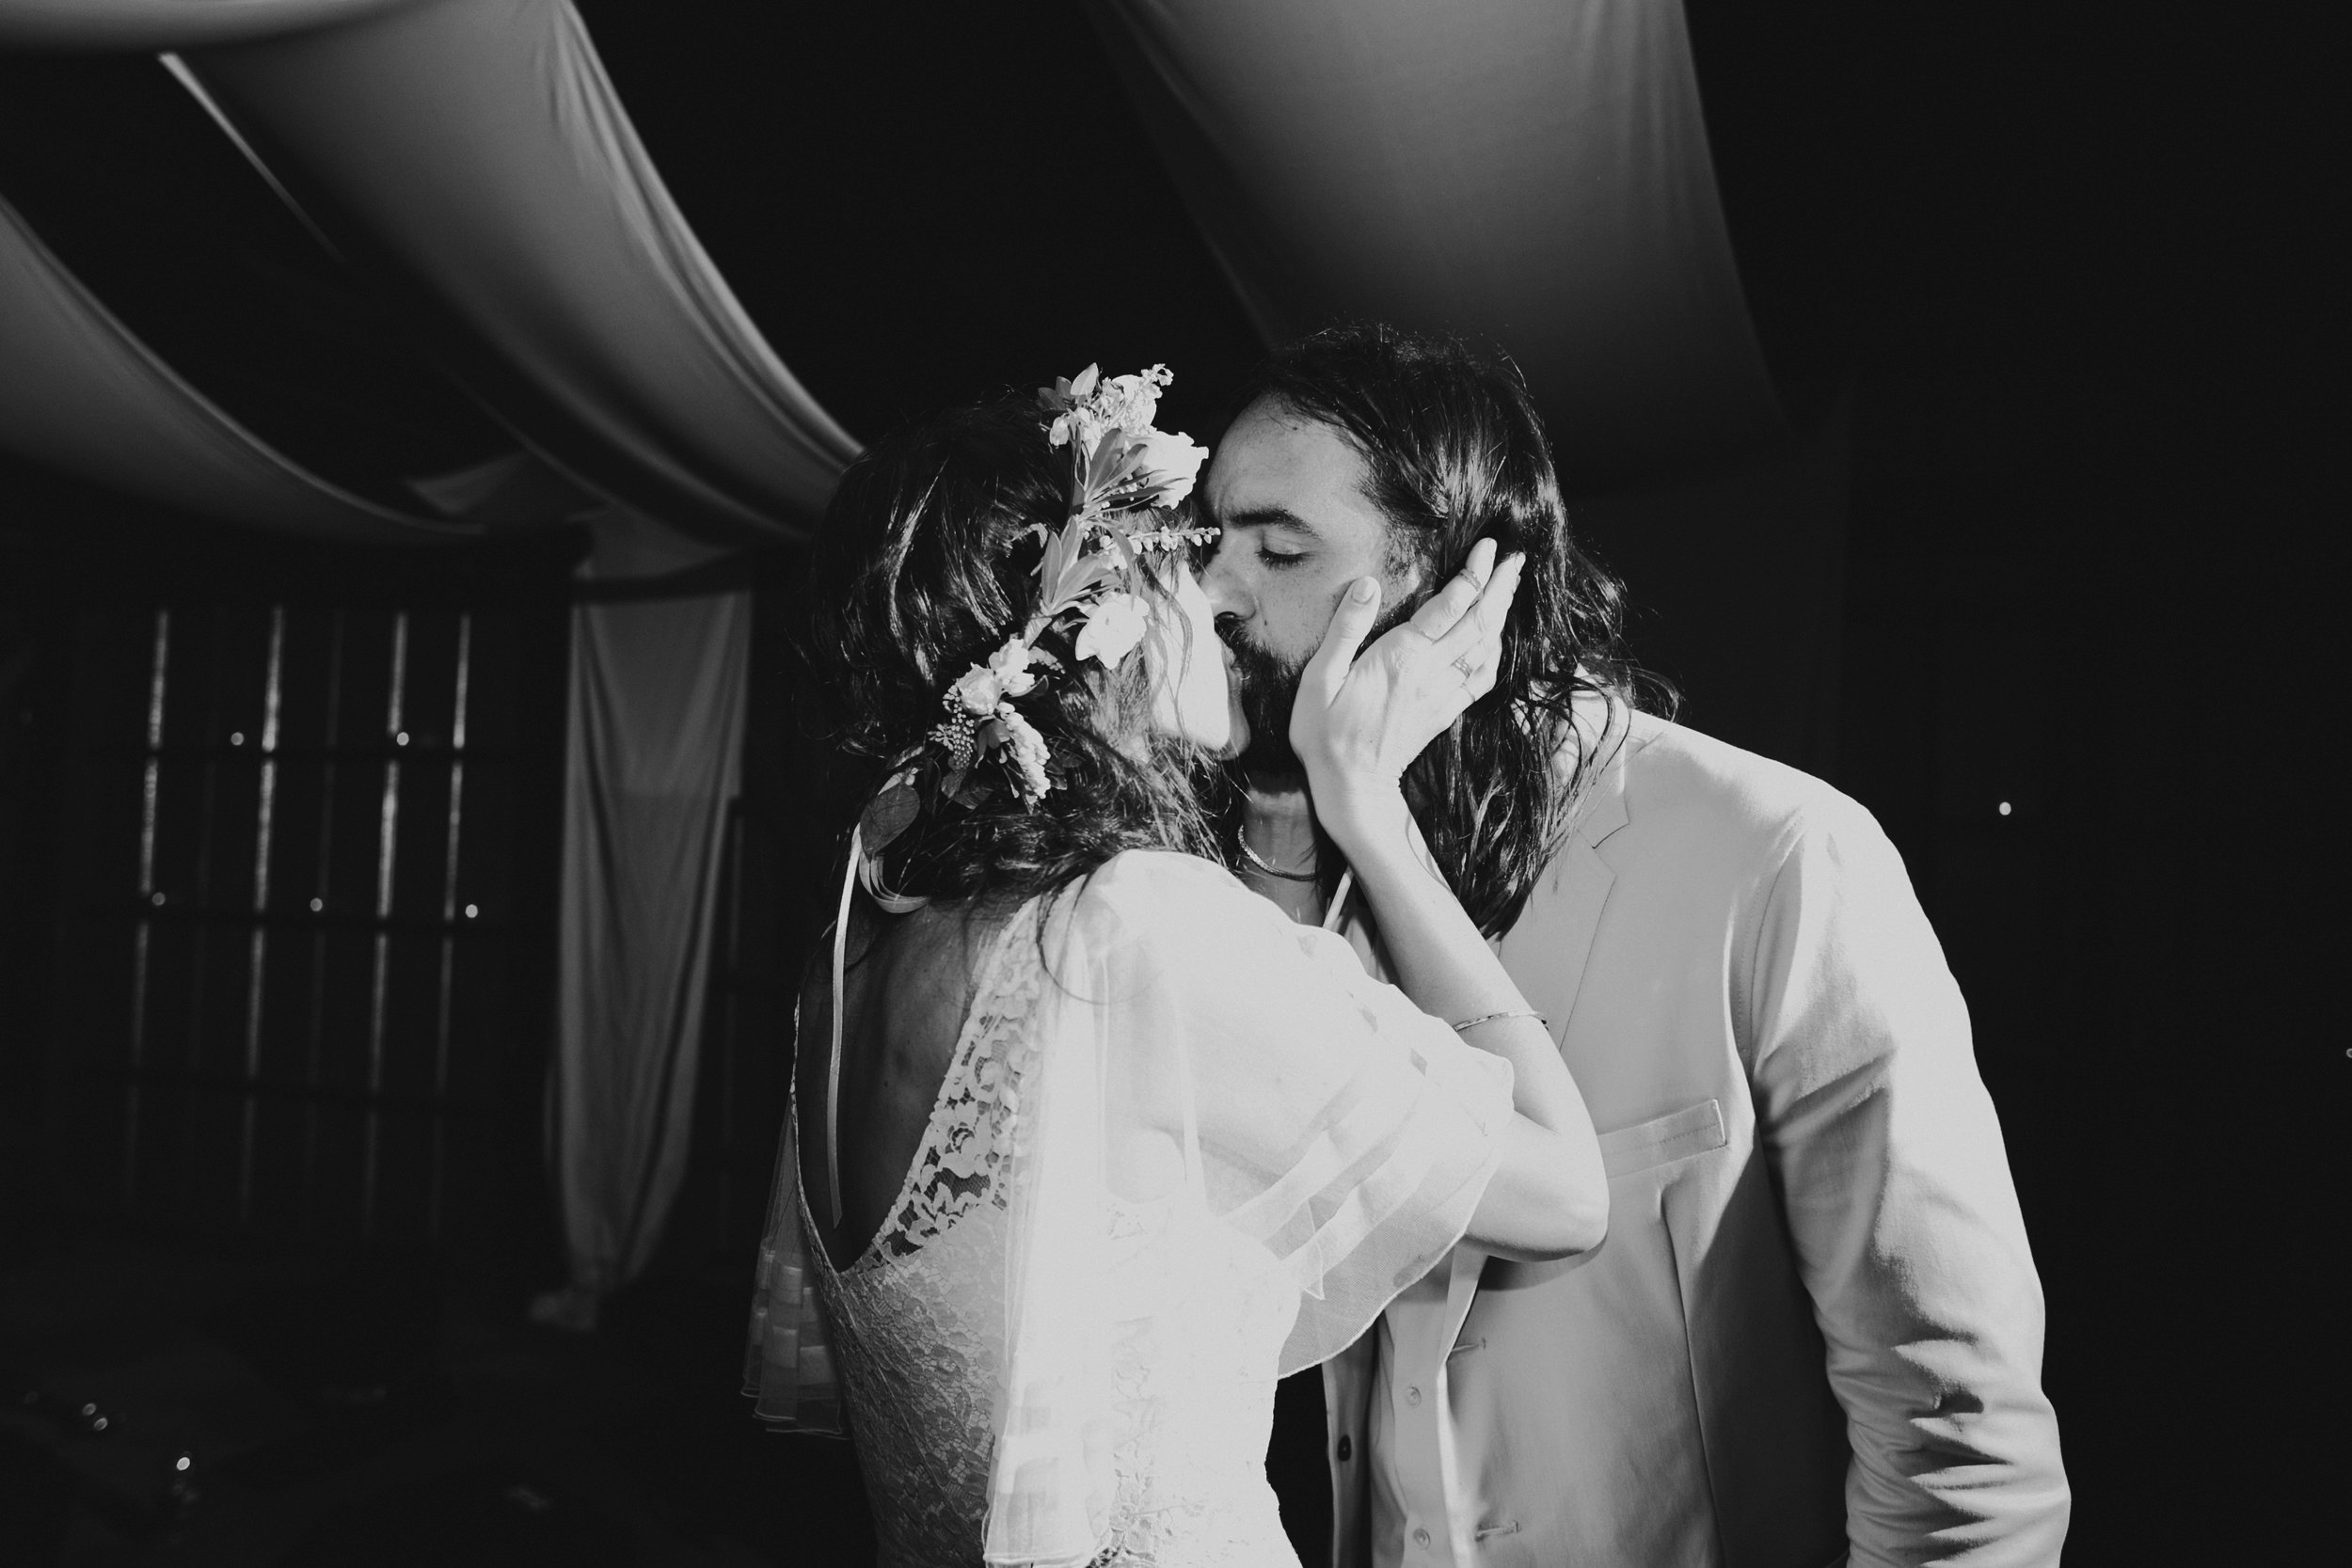 LIBERTY_VIEW_FARM_HIGHLAND_NY_WEDDING_CHELLISE_MICHAEL_PHOTOGRAPHY941.JPG